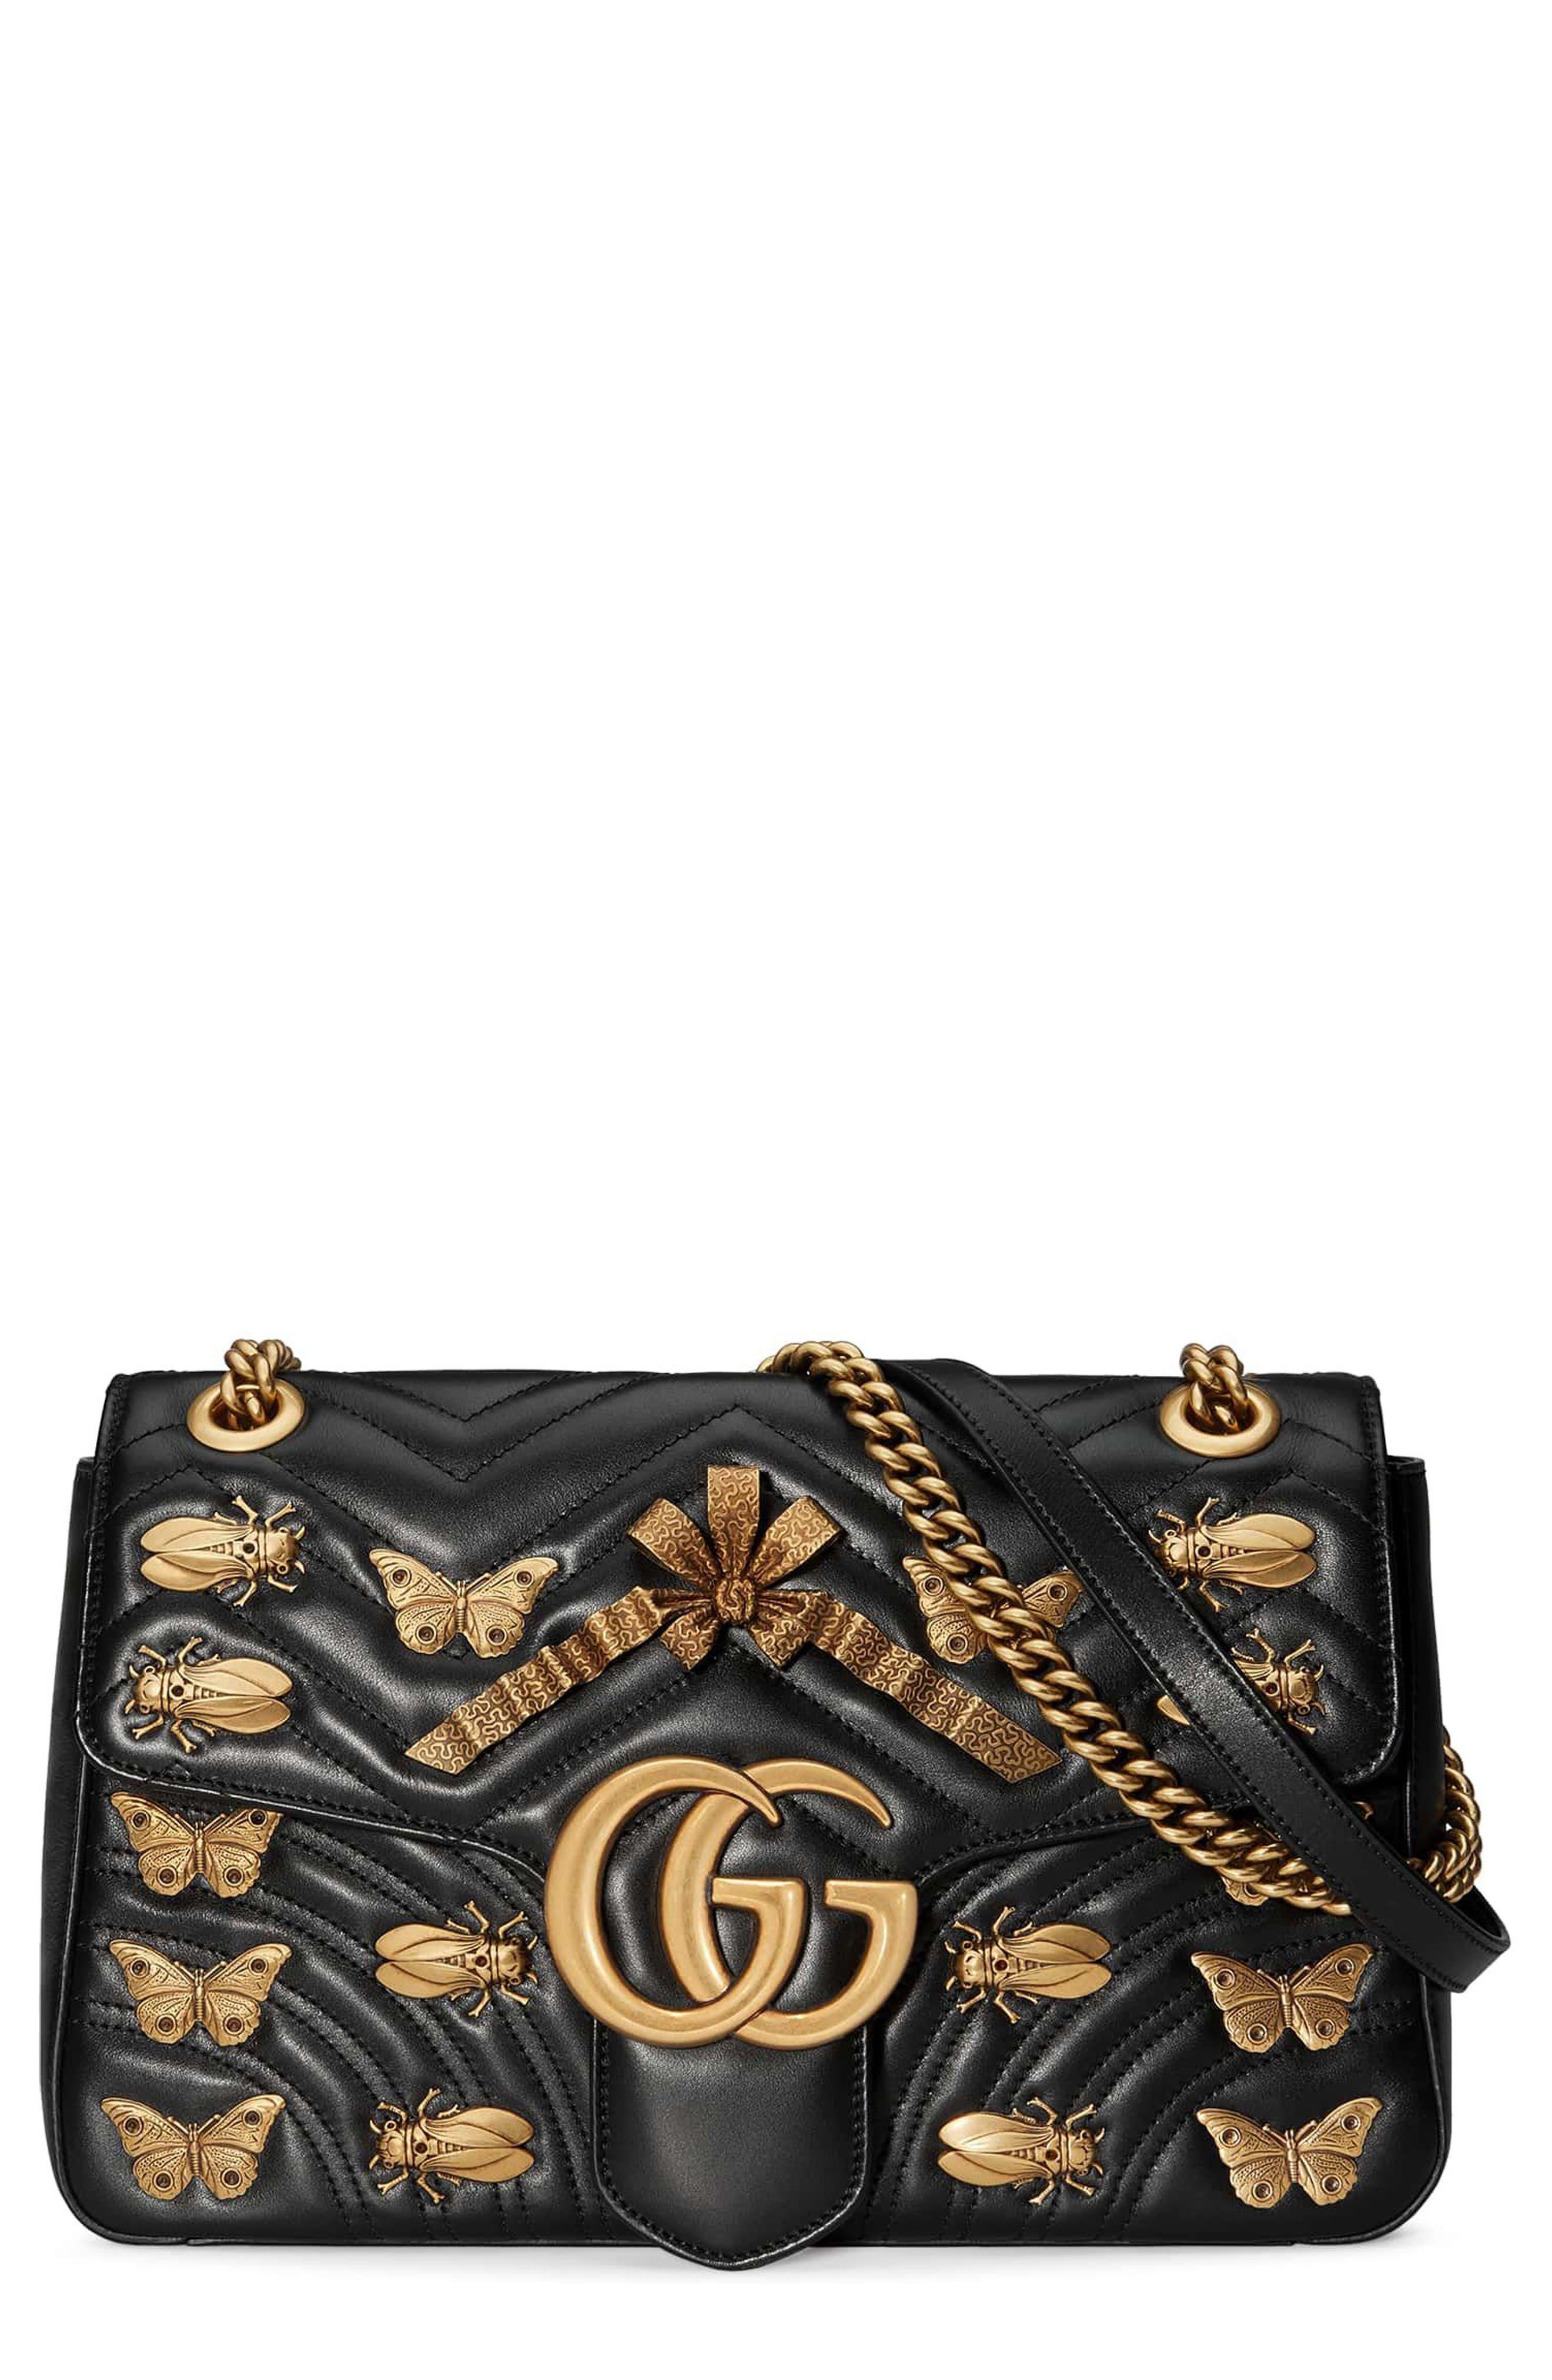 Medium GG Marmont 2.0 Animal Stud Matelassé Leather Shoulder Bag,                             Main thumbnail 1, color,                             001